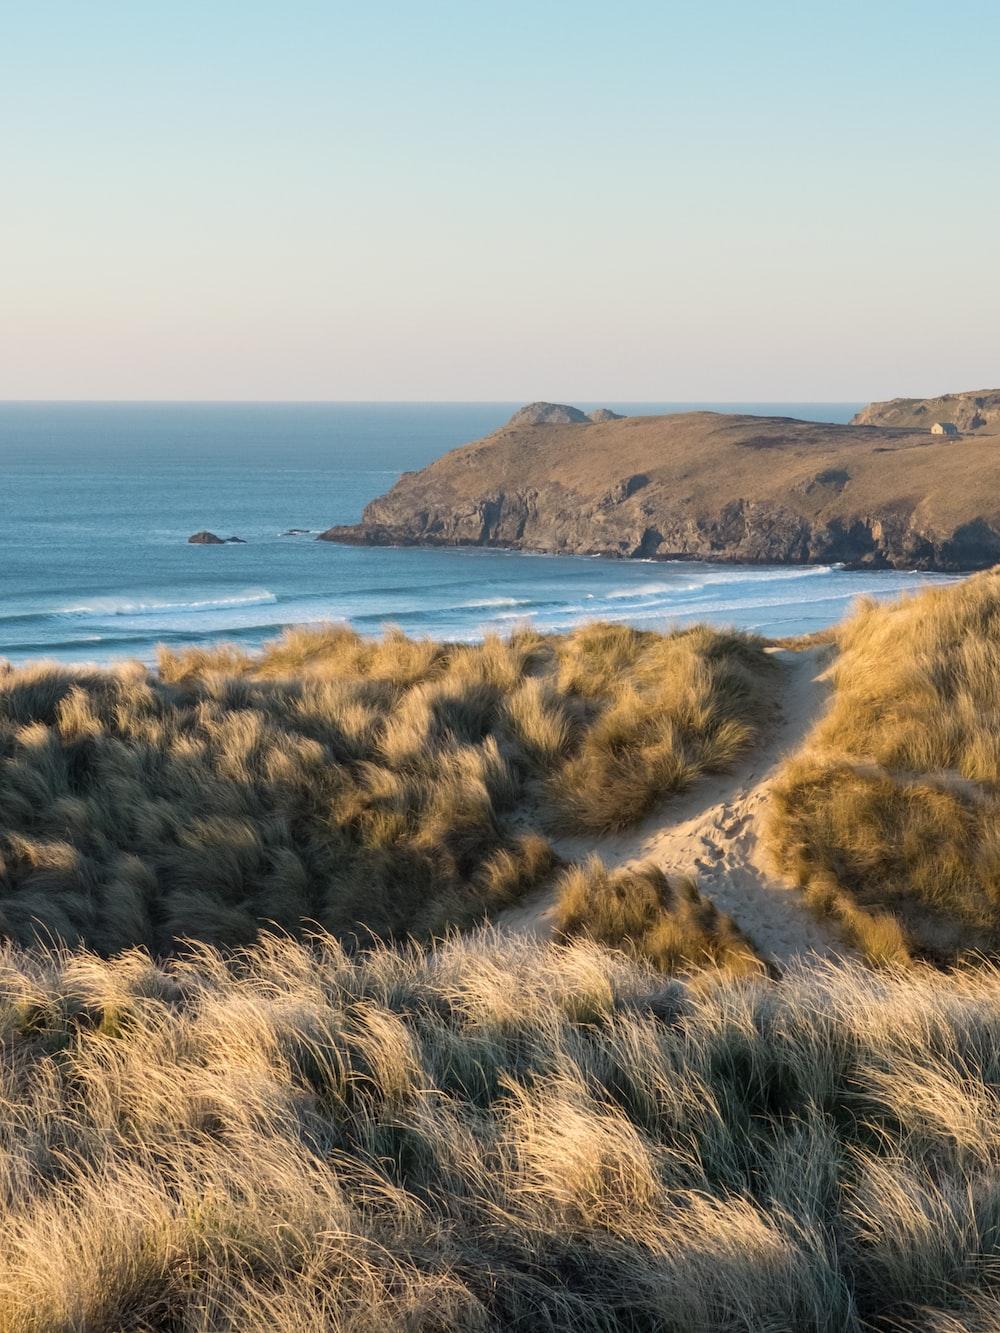 brown grass on seashore during daytime